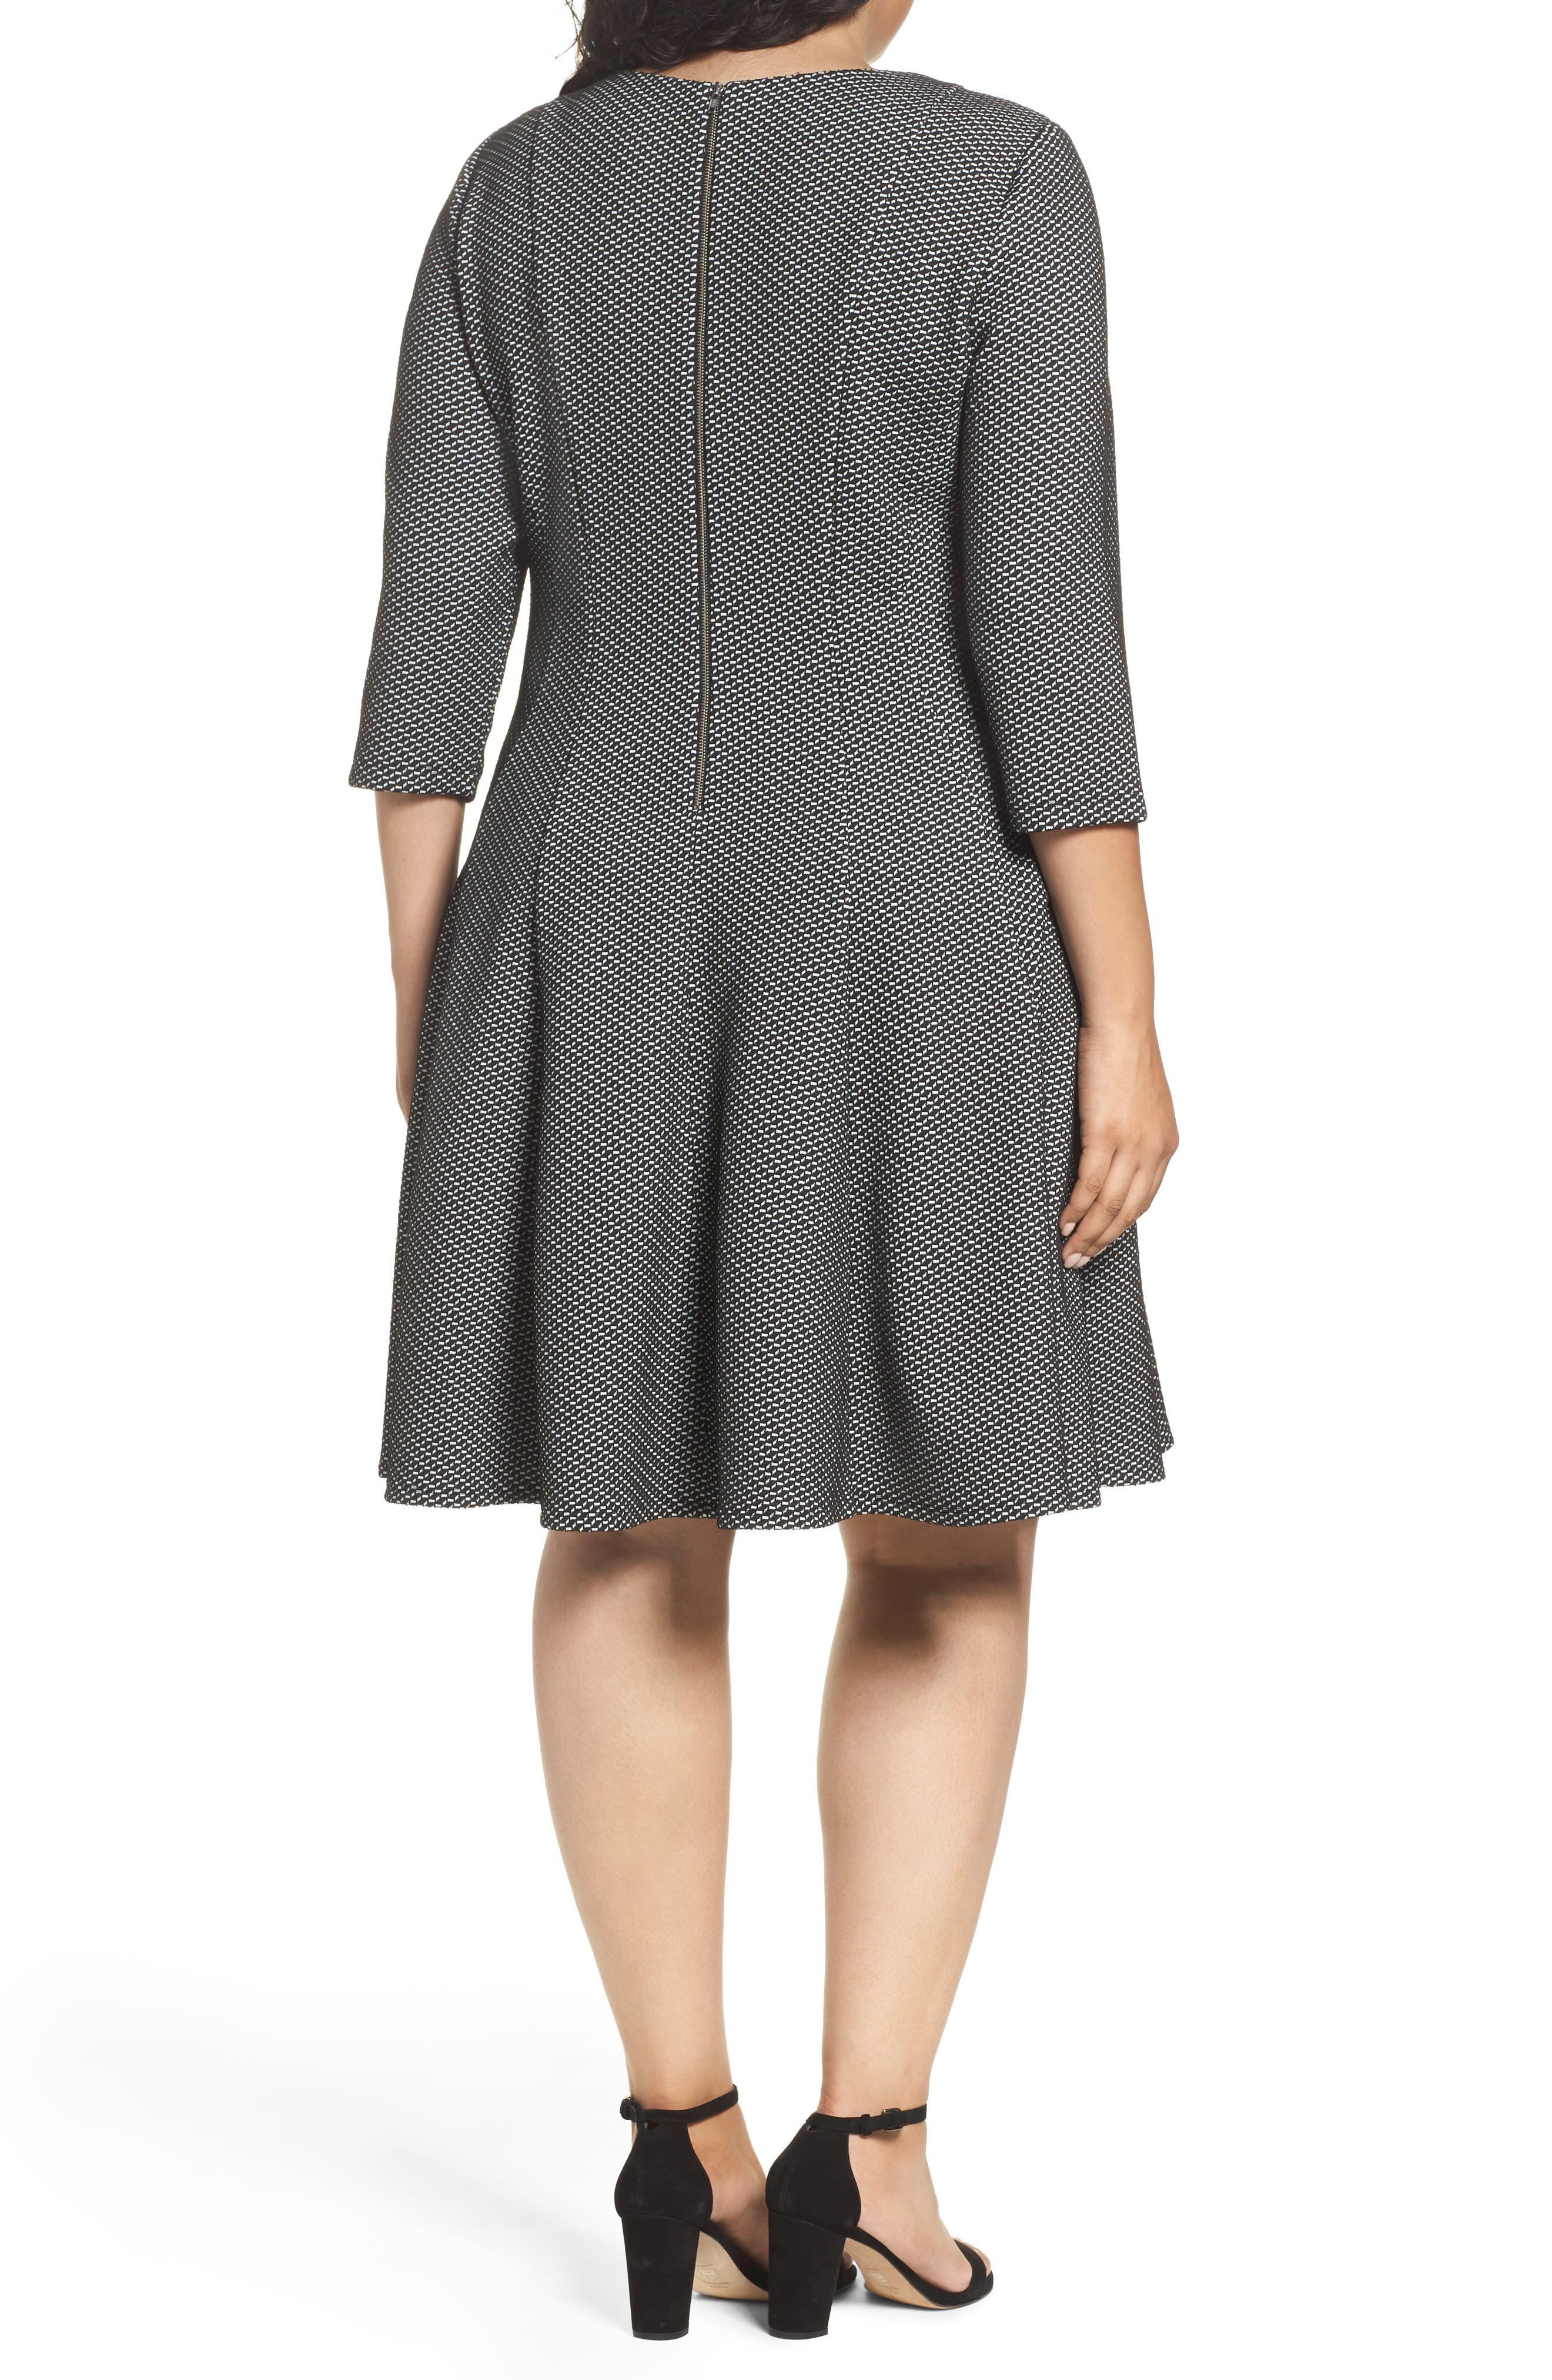 Alternate Image 2  - Gabby Skye Jacquard Fit & Flare Dress (Plus Size)